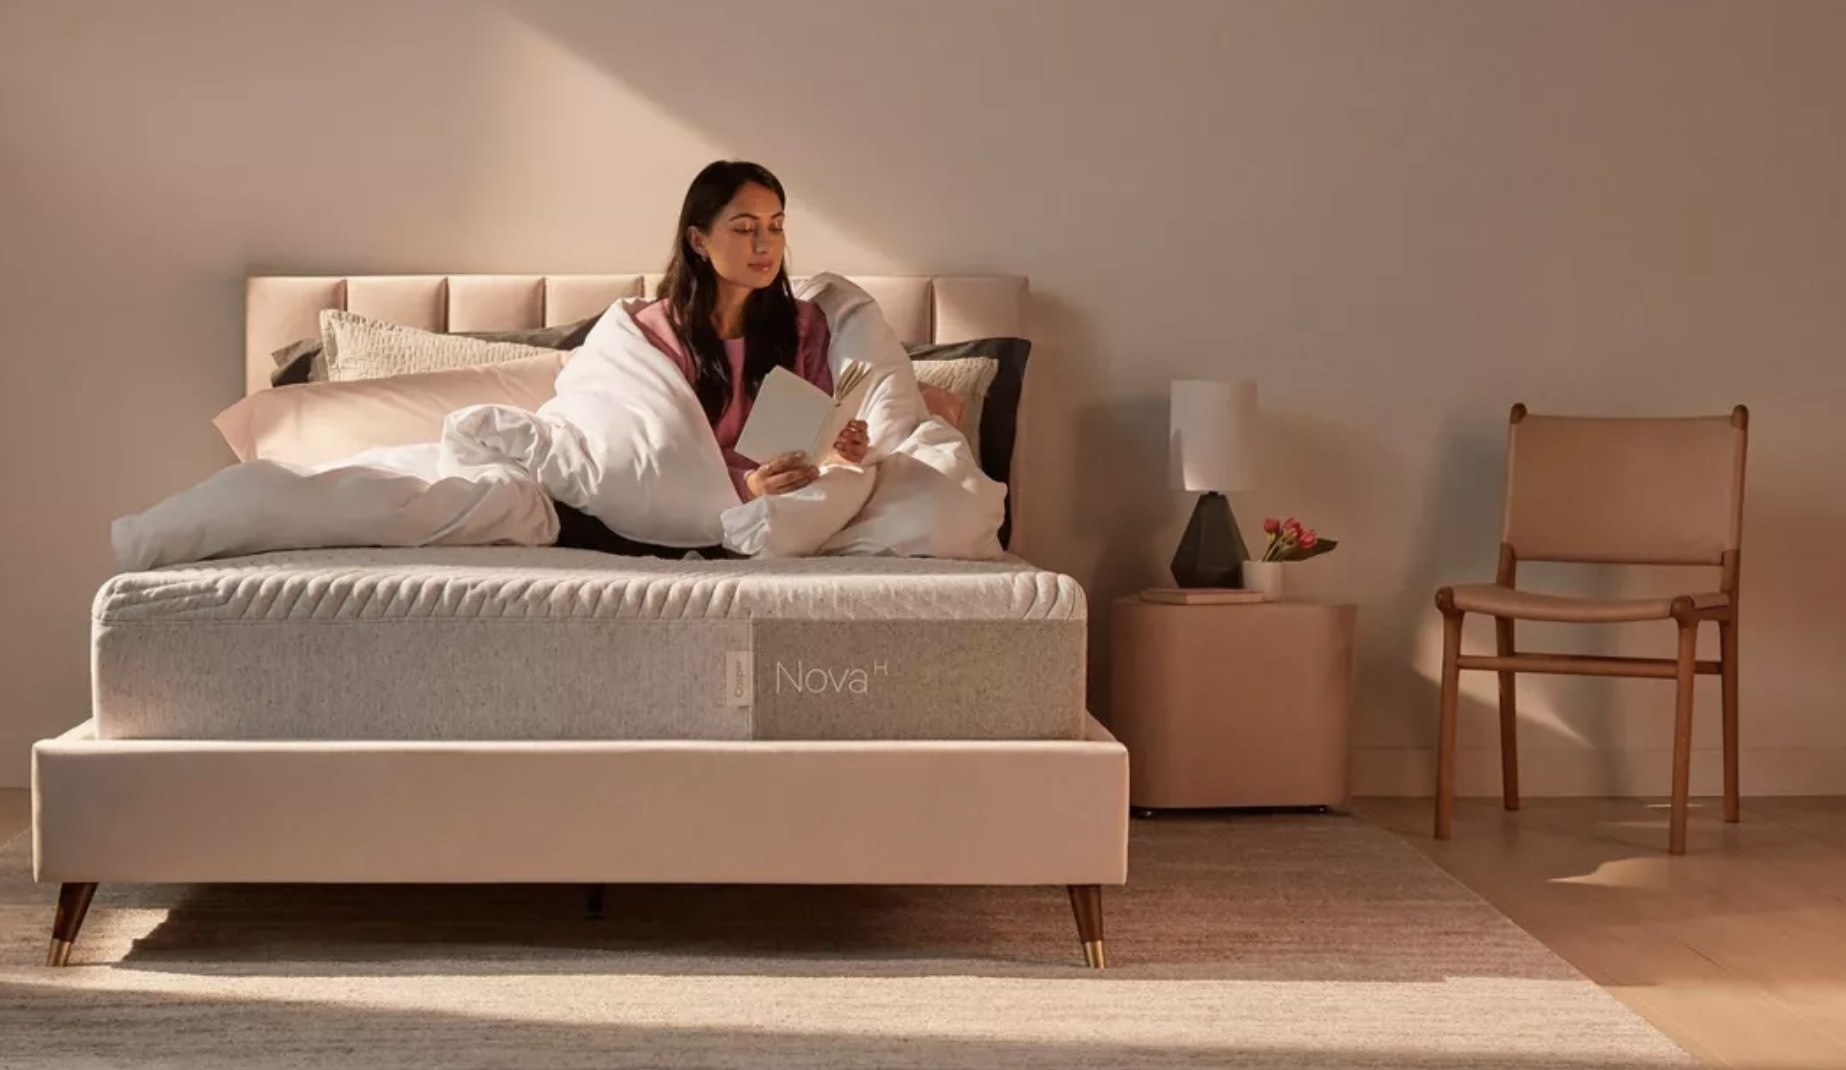 a model reading on a mattress